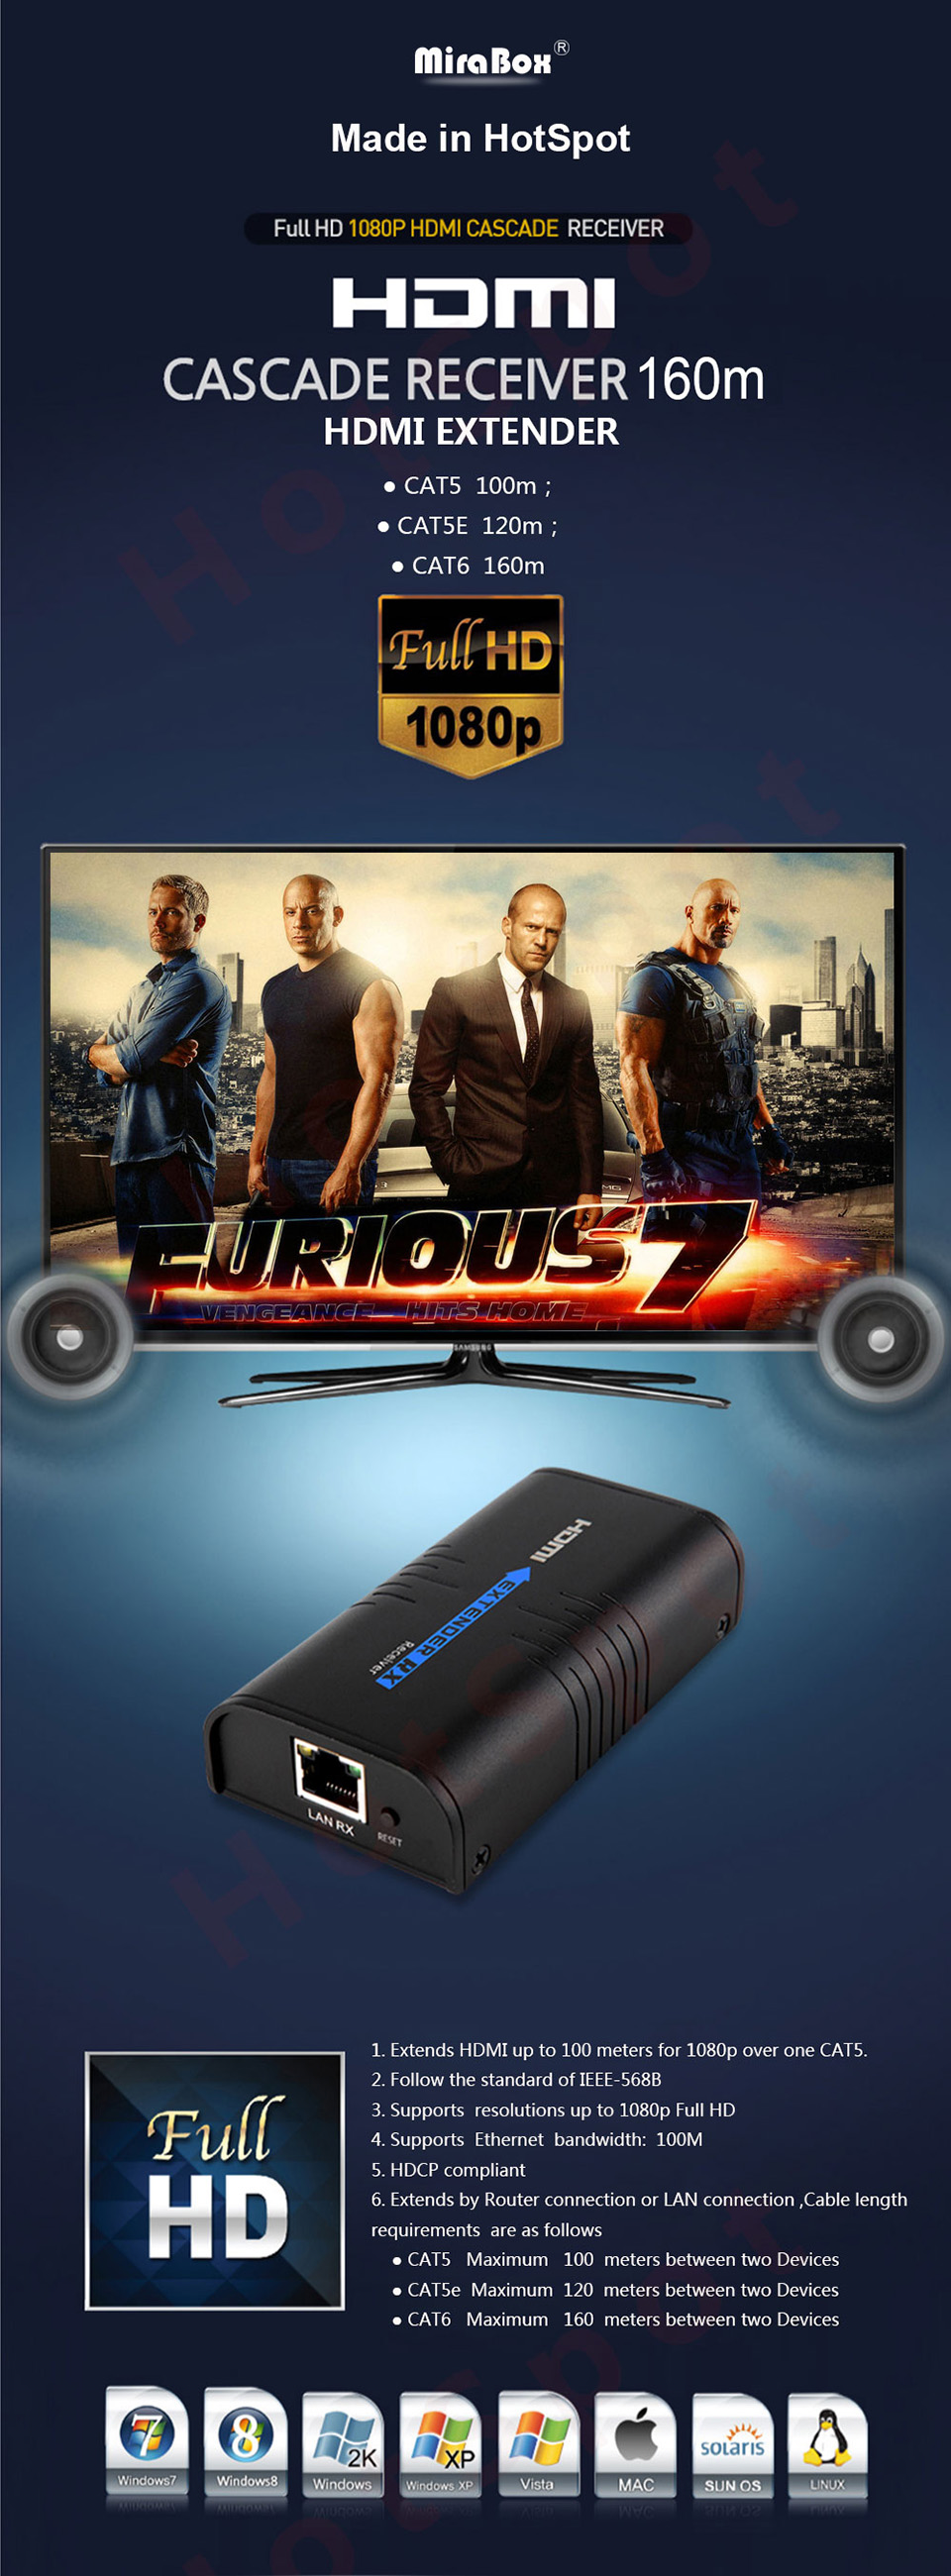 MiraBox HDMI Extender Over Splitter IPTCP UTPSTP CAT5e6 Rj45 LAN Network Support 1080p 120m HDMI Transmitter and Receiver (2)